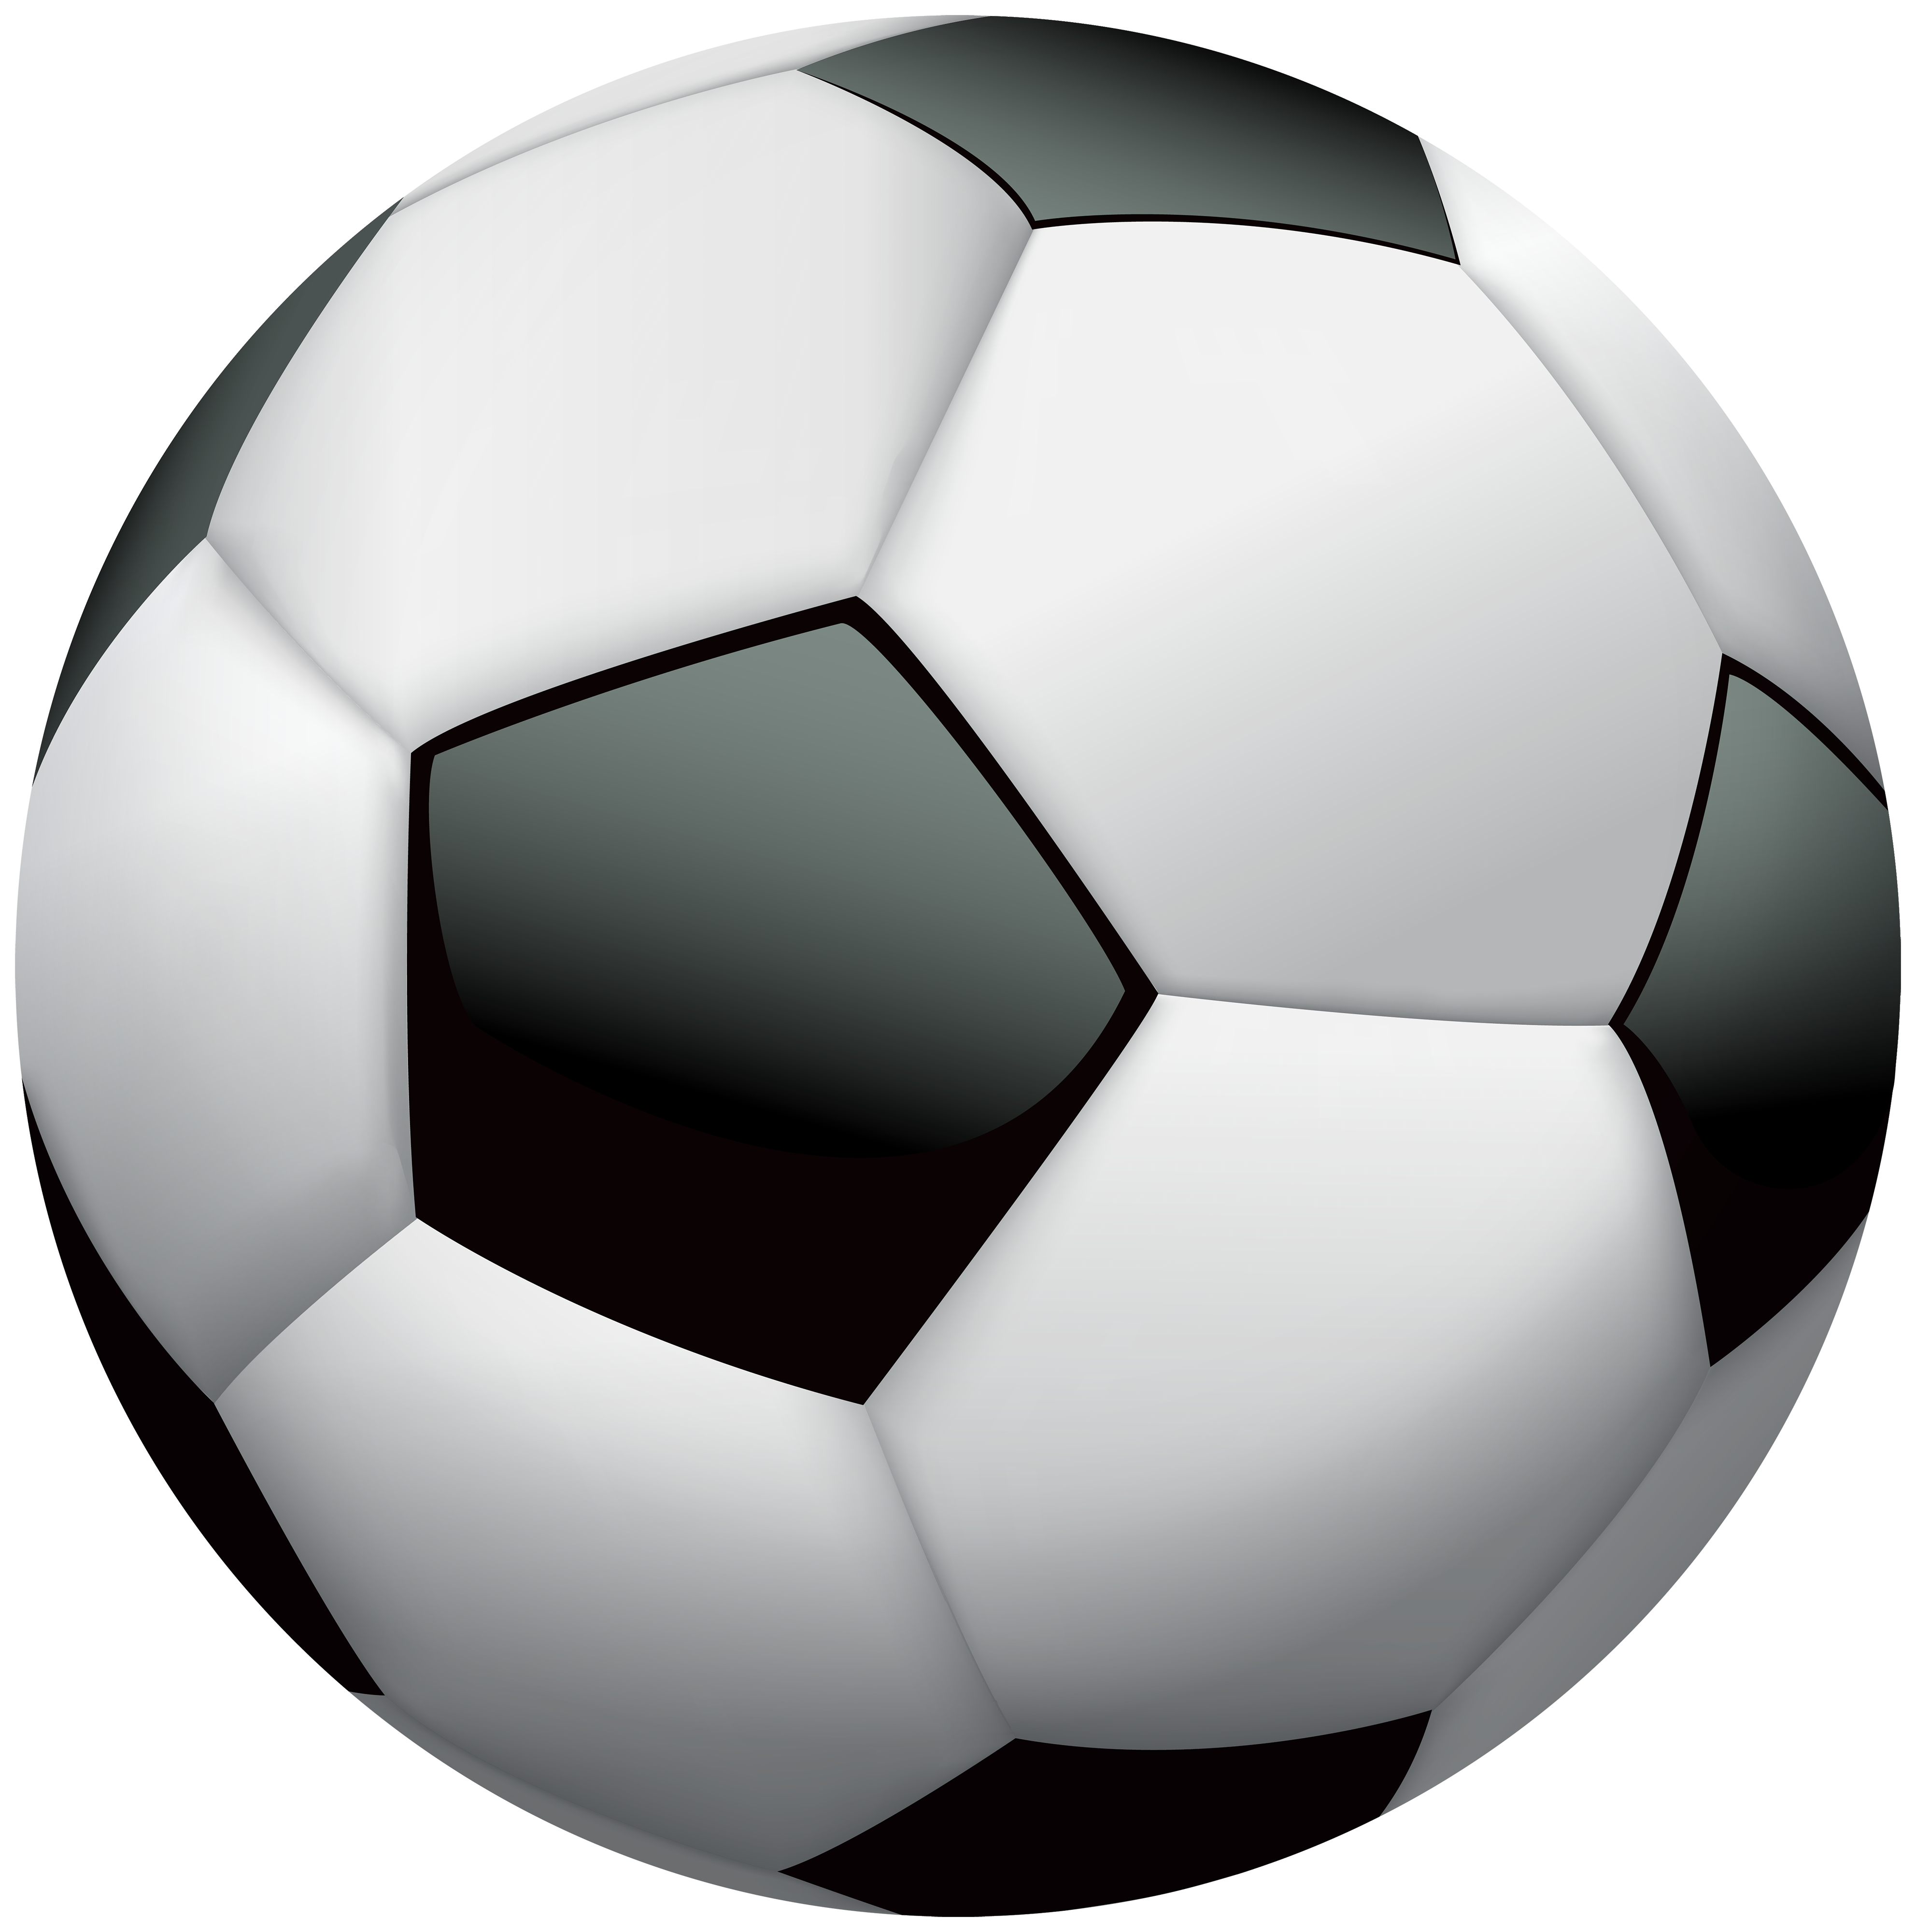 Soccer ball clip art 2 3.